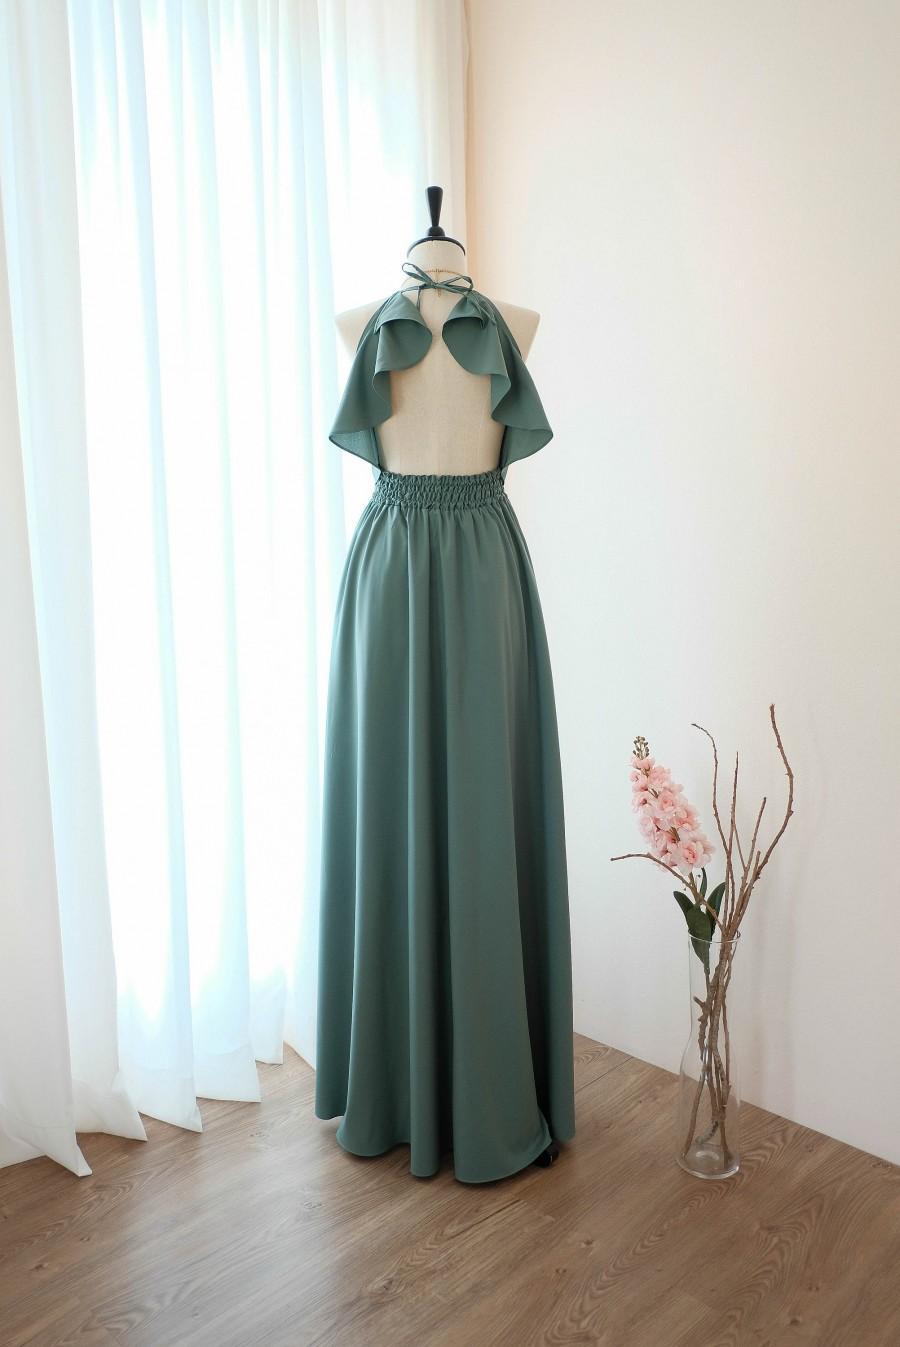 Свадьба - Sage Green bridesmaid dress Long Earthy Sage Green dress Wedding Dress Green cocktail Party dress Backless Halter Dress Evening gown